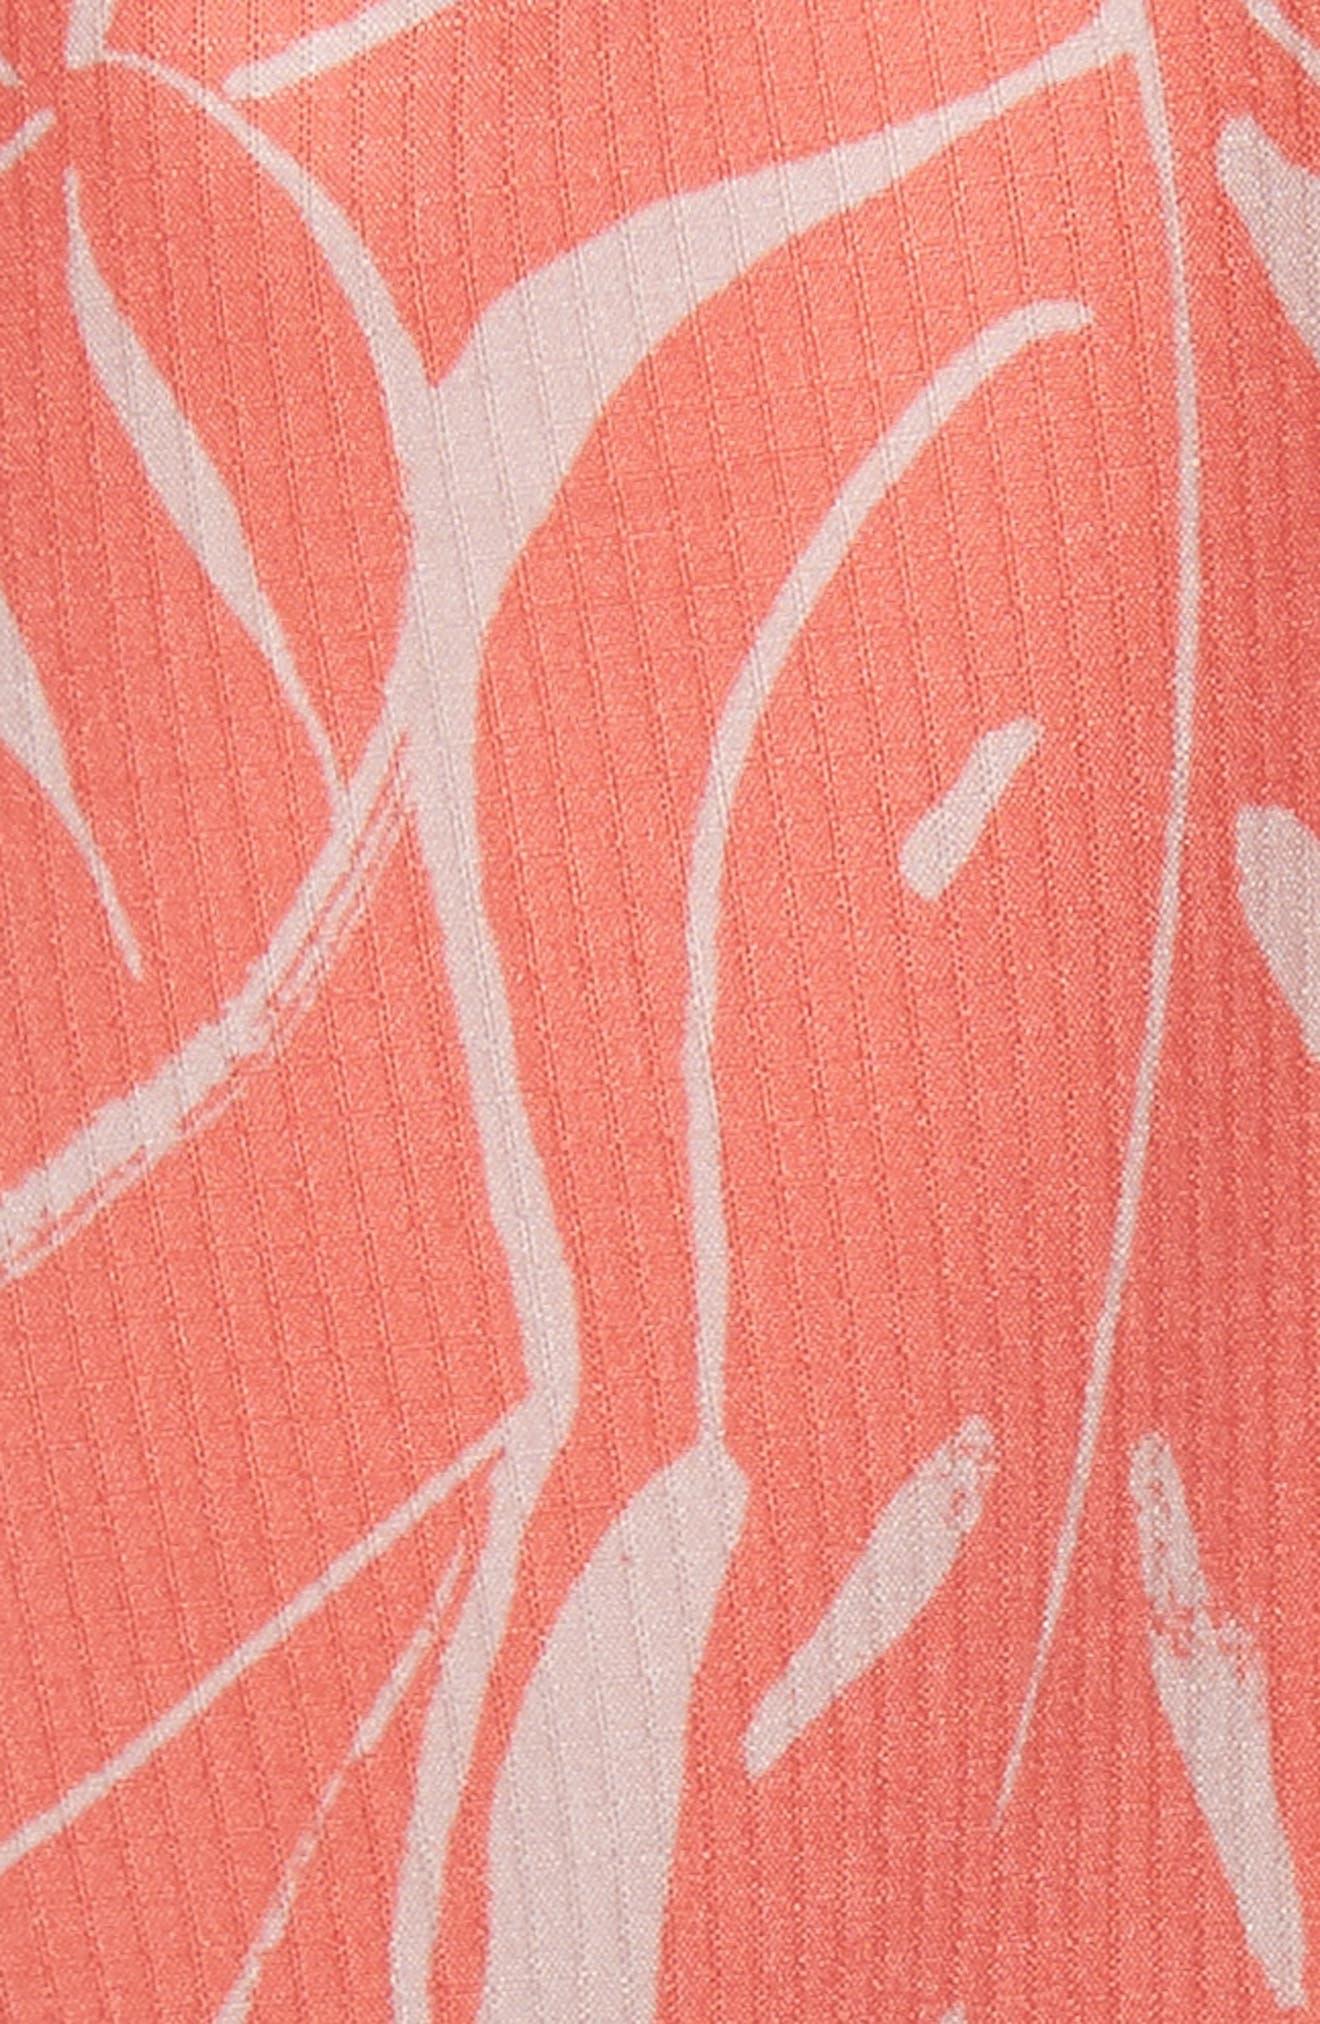 Charles Leaf Print Swim Trunks,                             Alternate thumbnail 5, color,                             Tangerine Coral